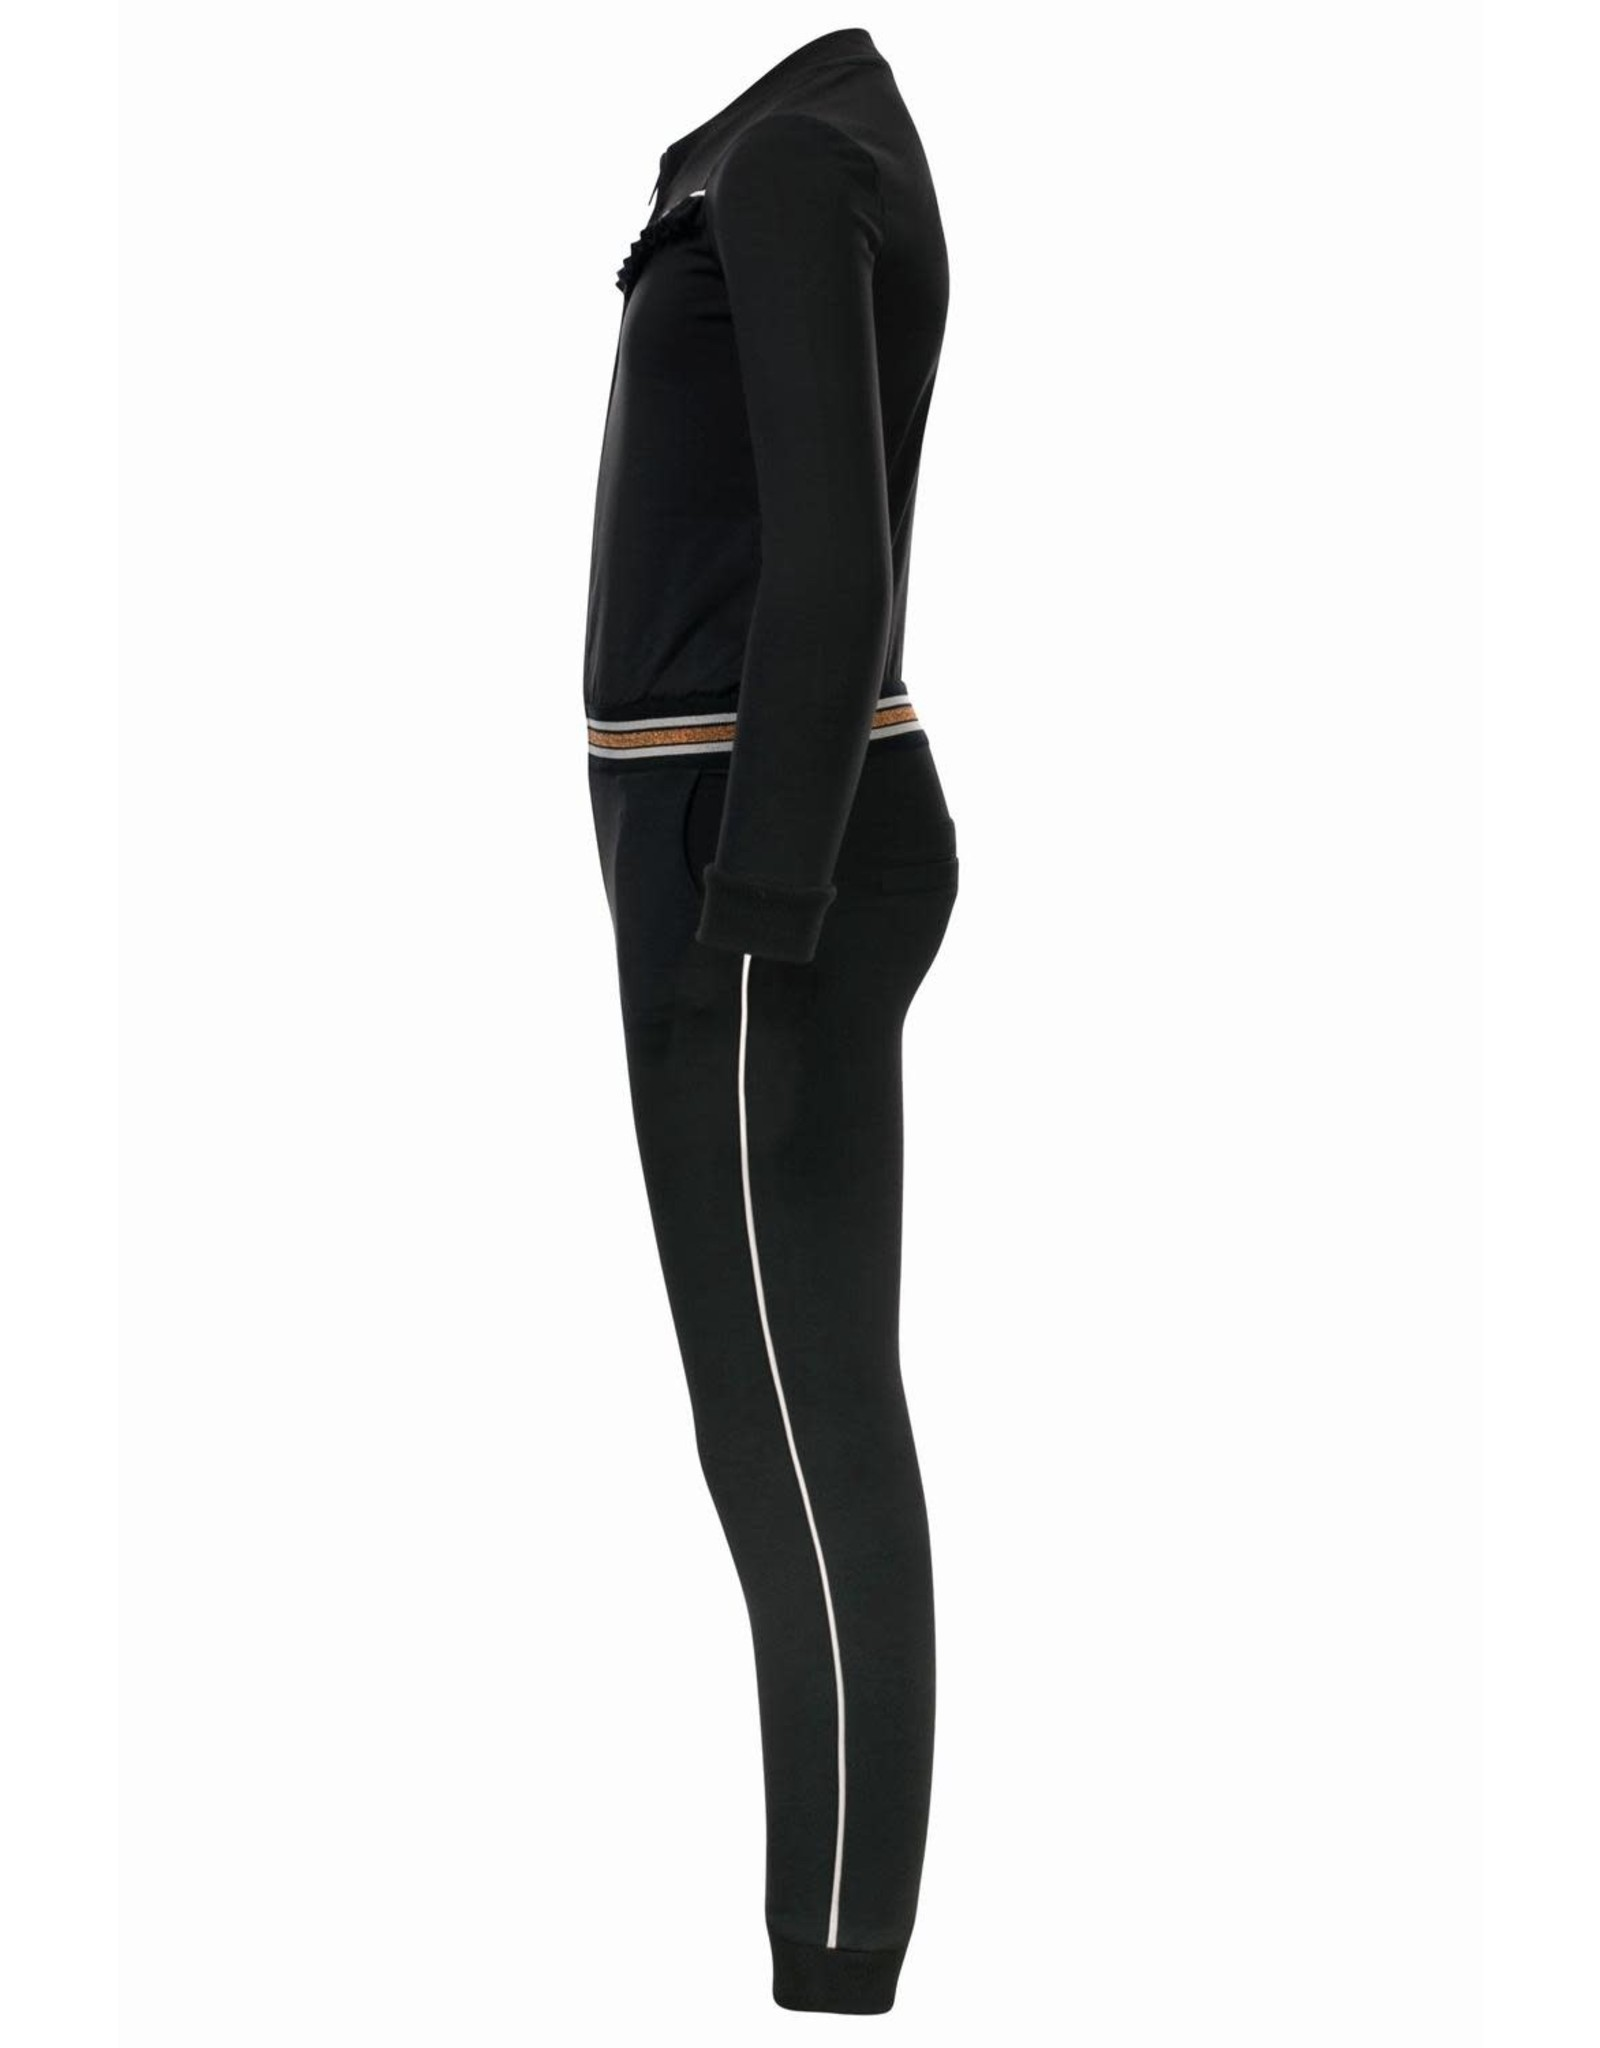 Looxs Girls sporty jumpsuit Black